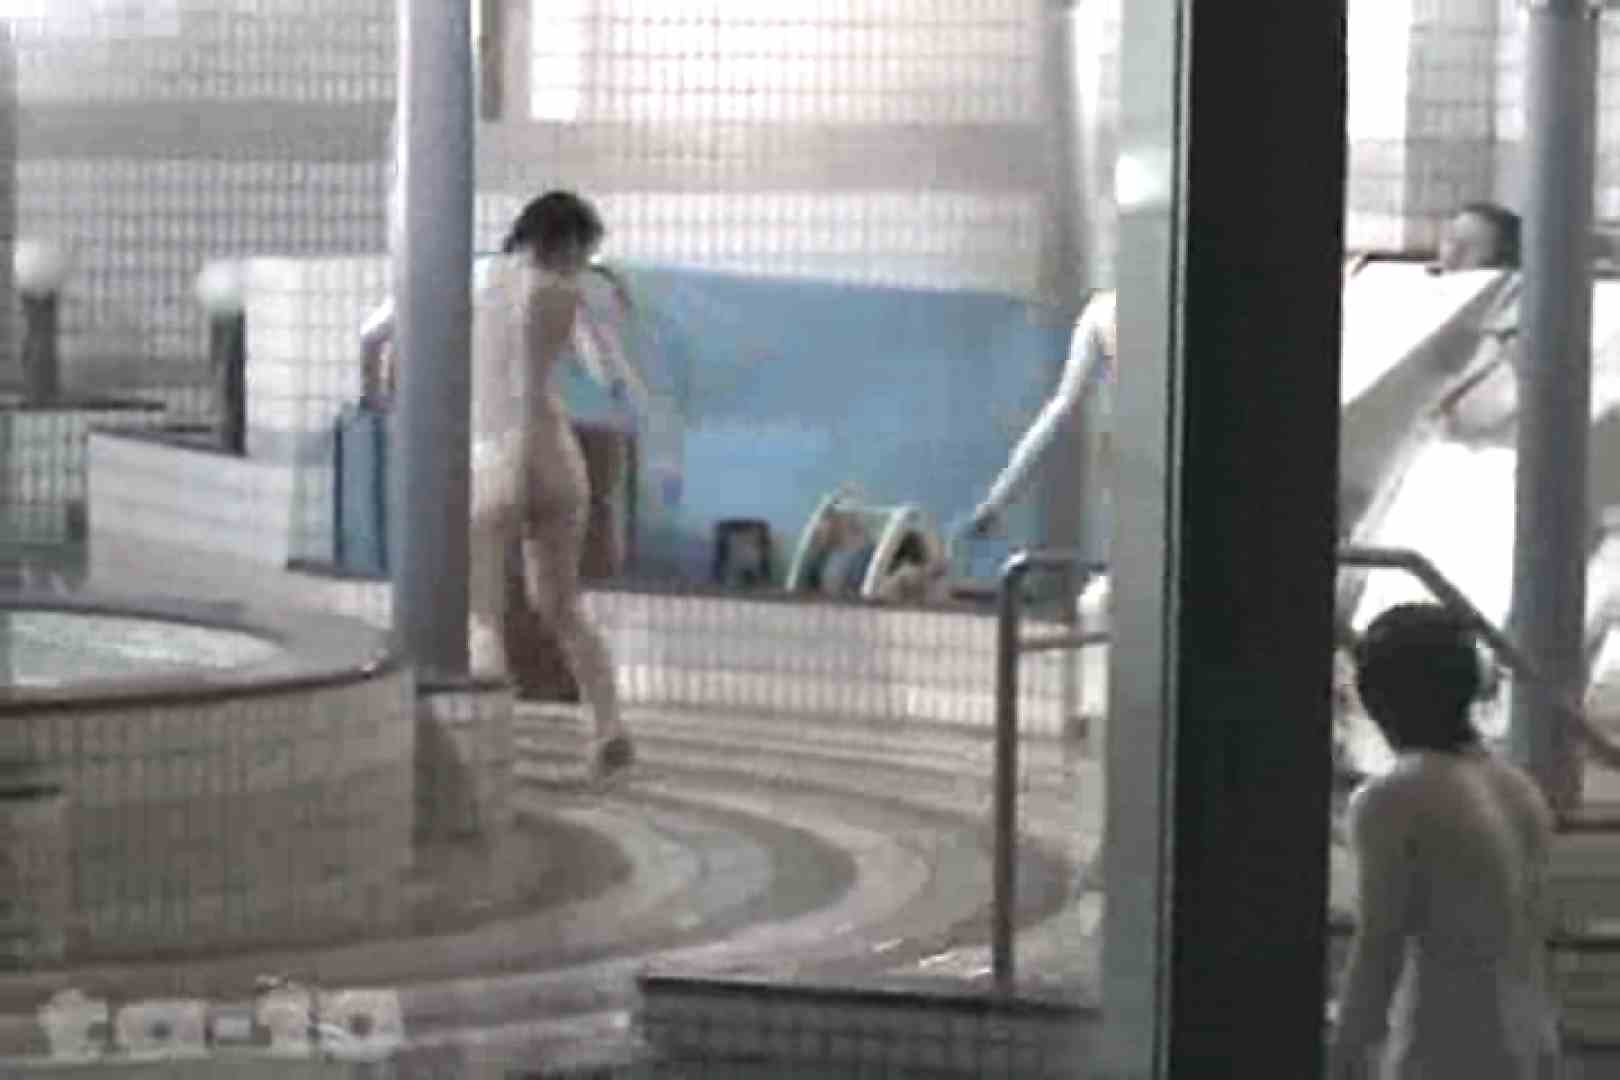 合宿ホテル女風呂盗撮高画質版 Vol.10 合宿中の出来事 | 女風呂 盗撮 58画像 51